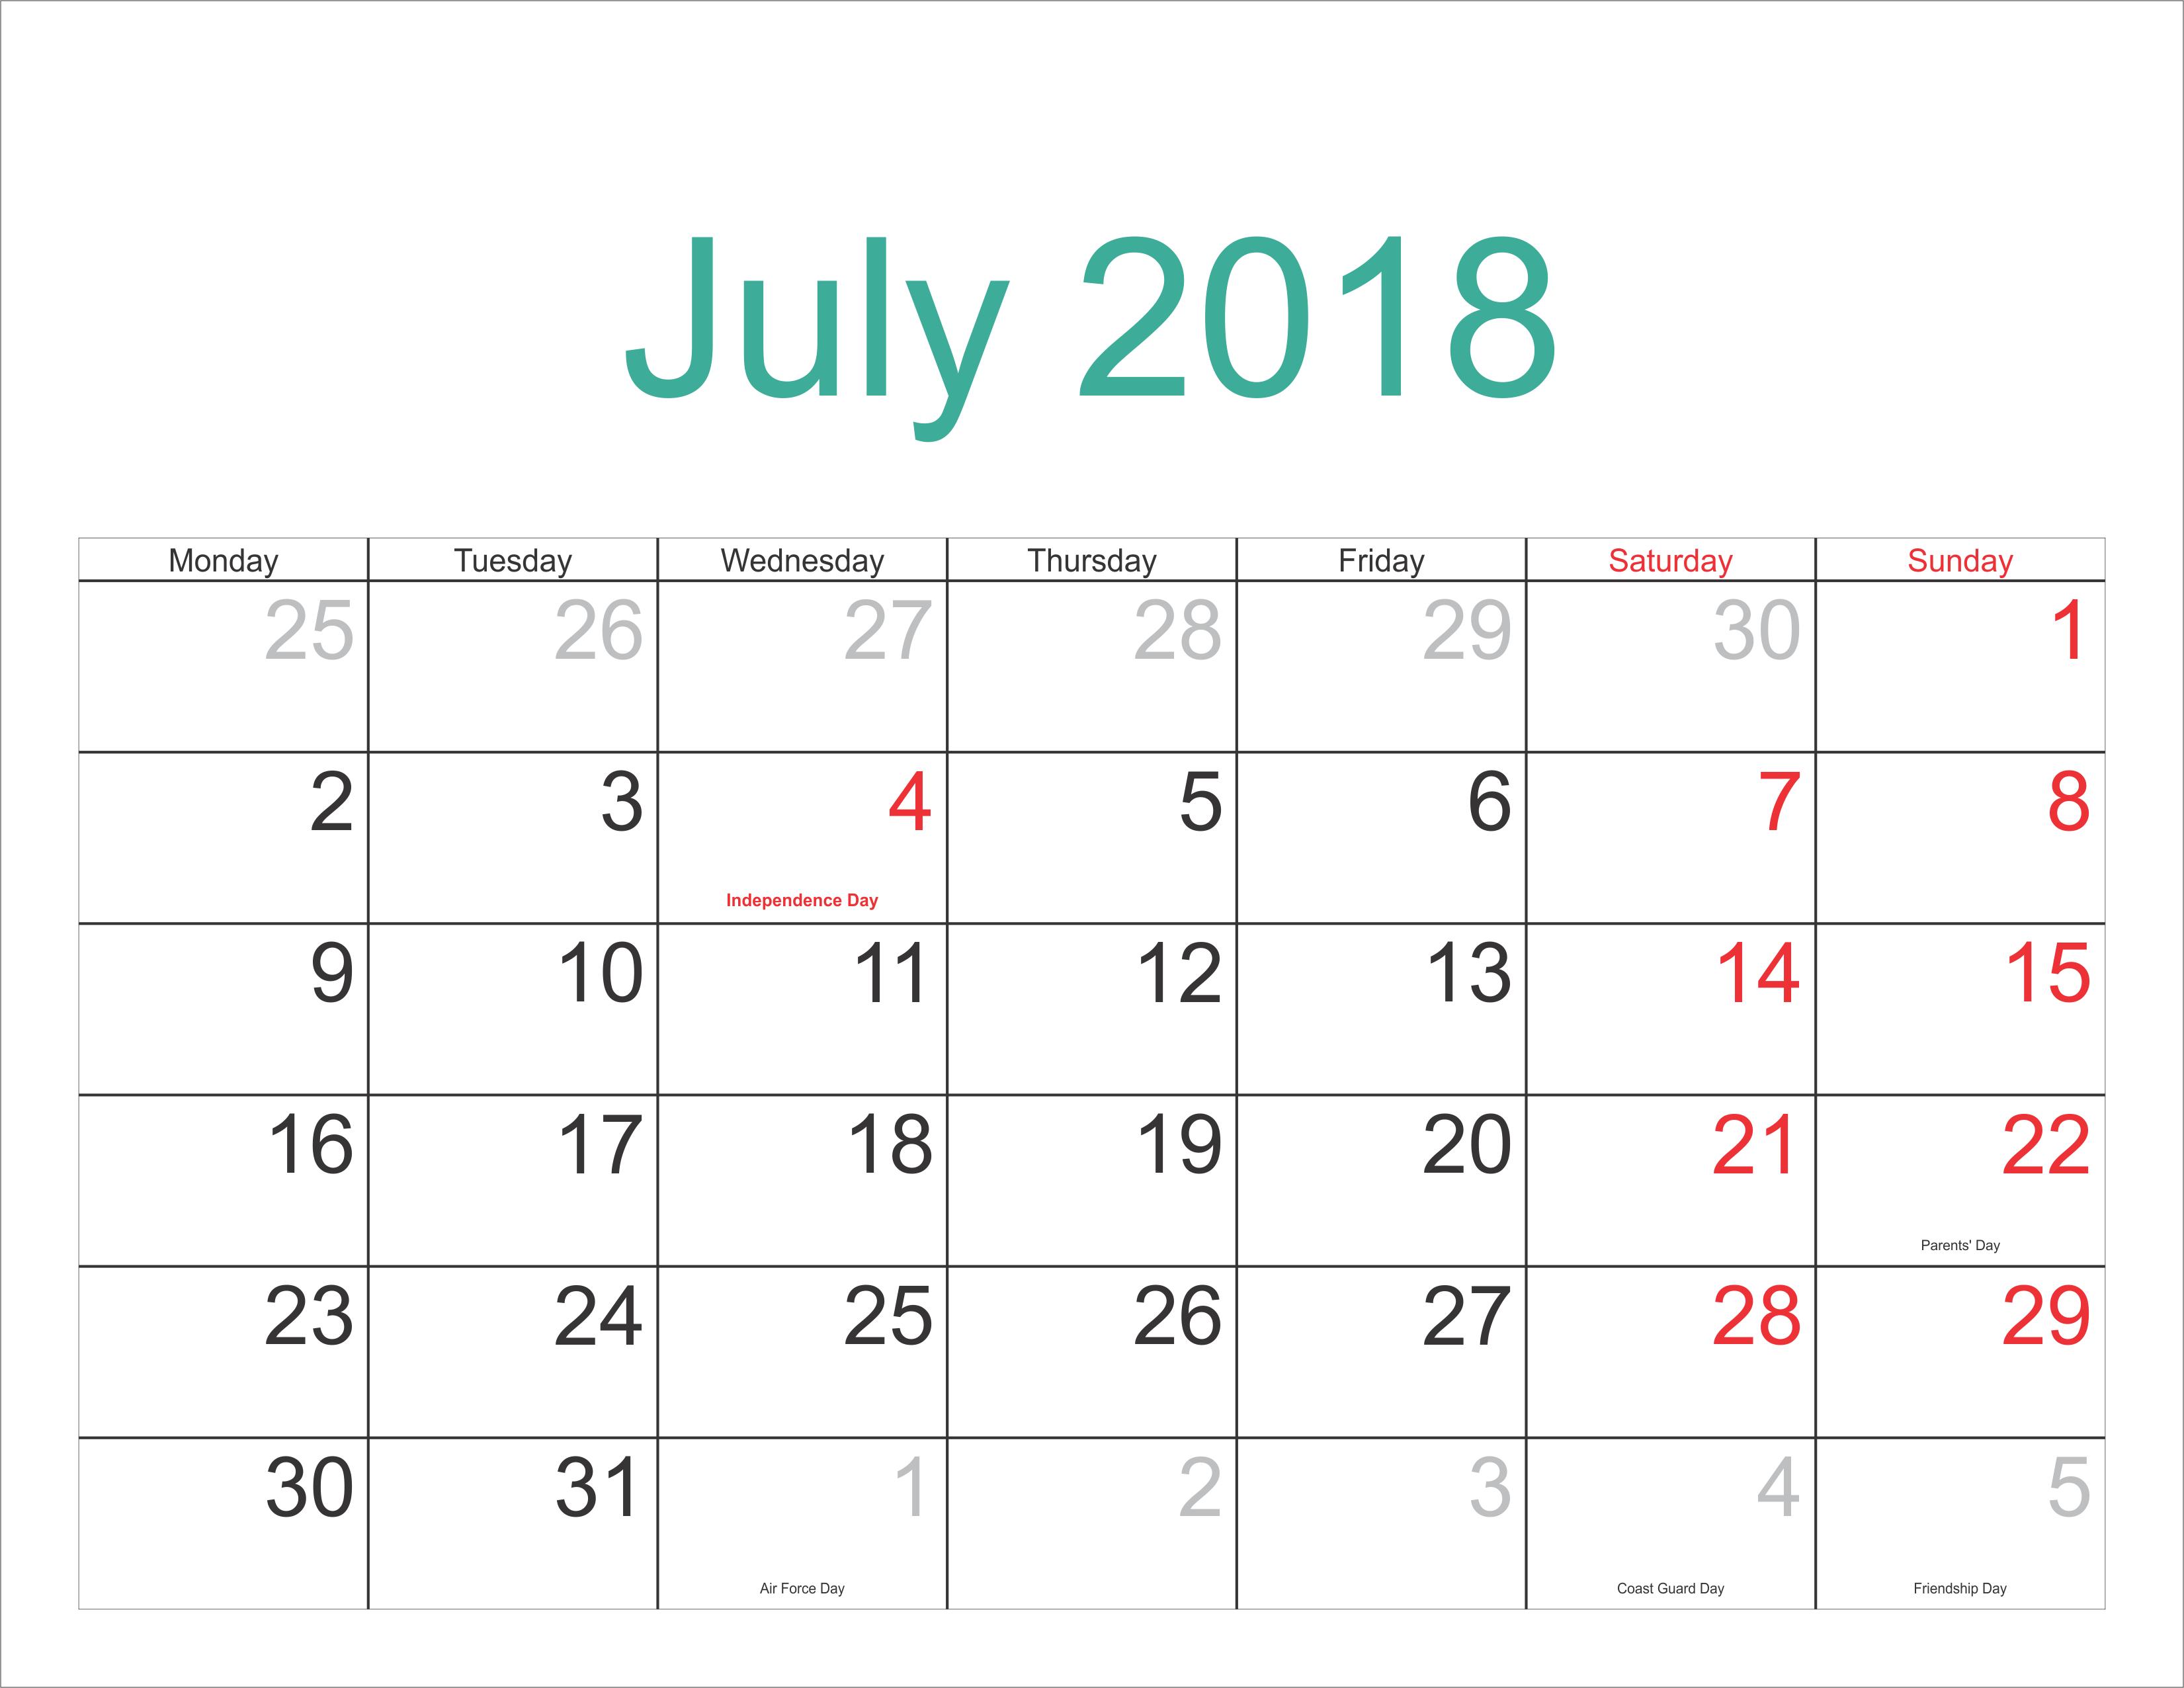 Decorative July 2018 Calendar, July 2018 Calendar Pdf, Word, Excel with Philippine Blank July Calendar Printable